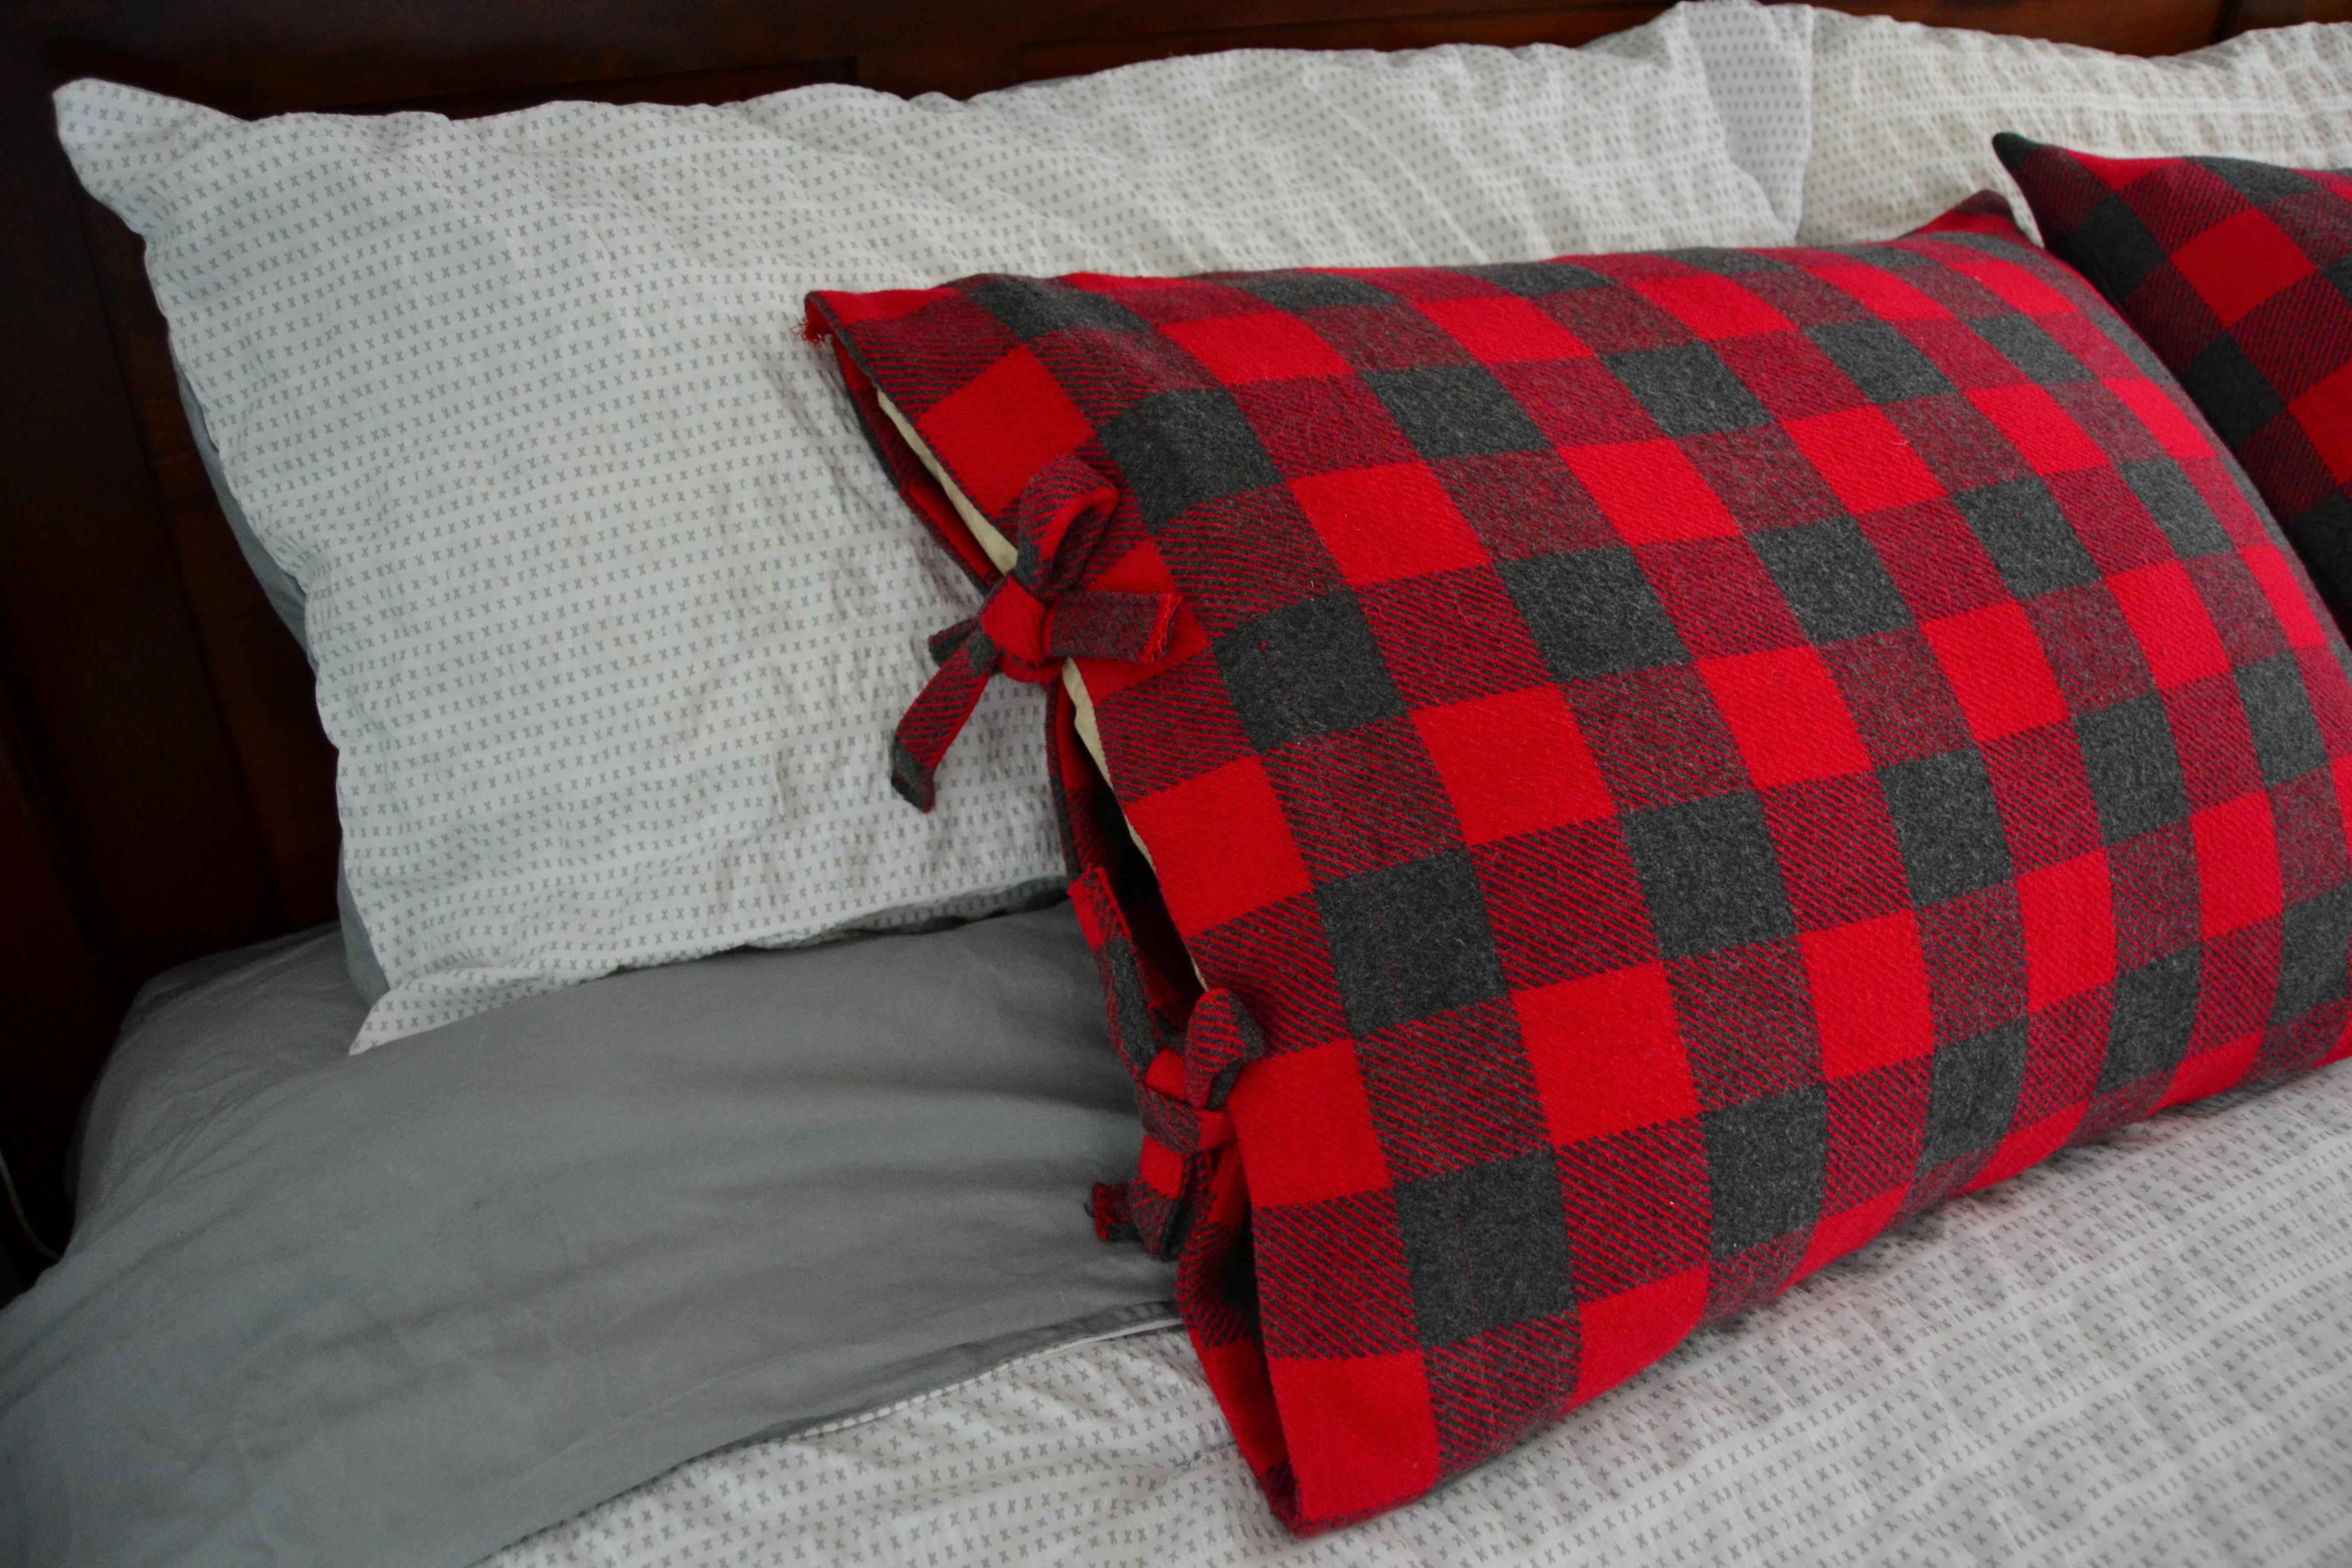 DIY buffalo check pillowcase with ties